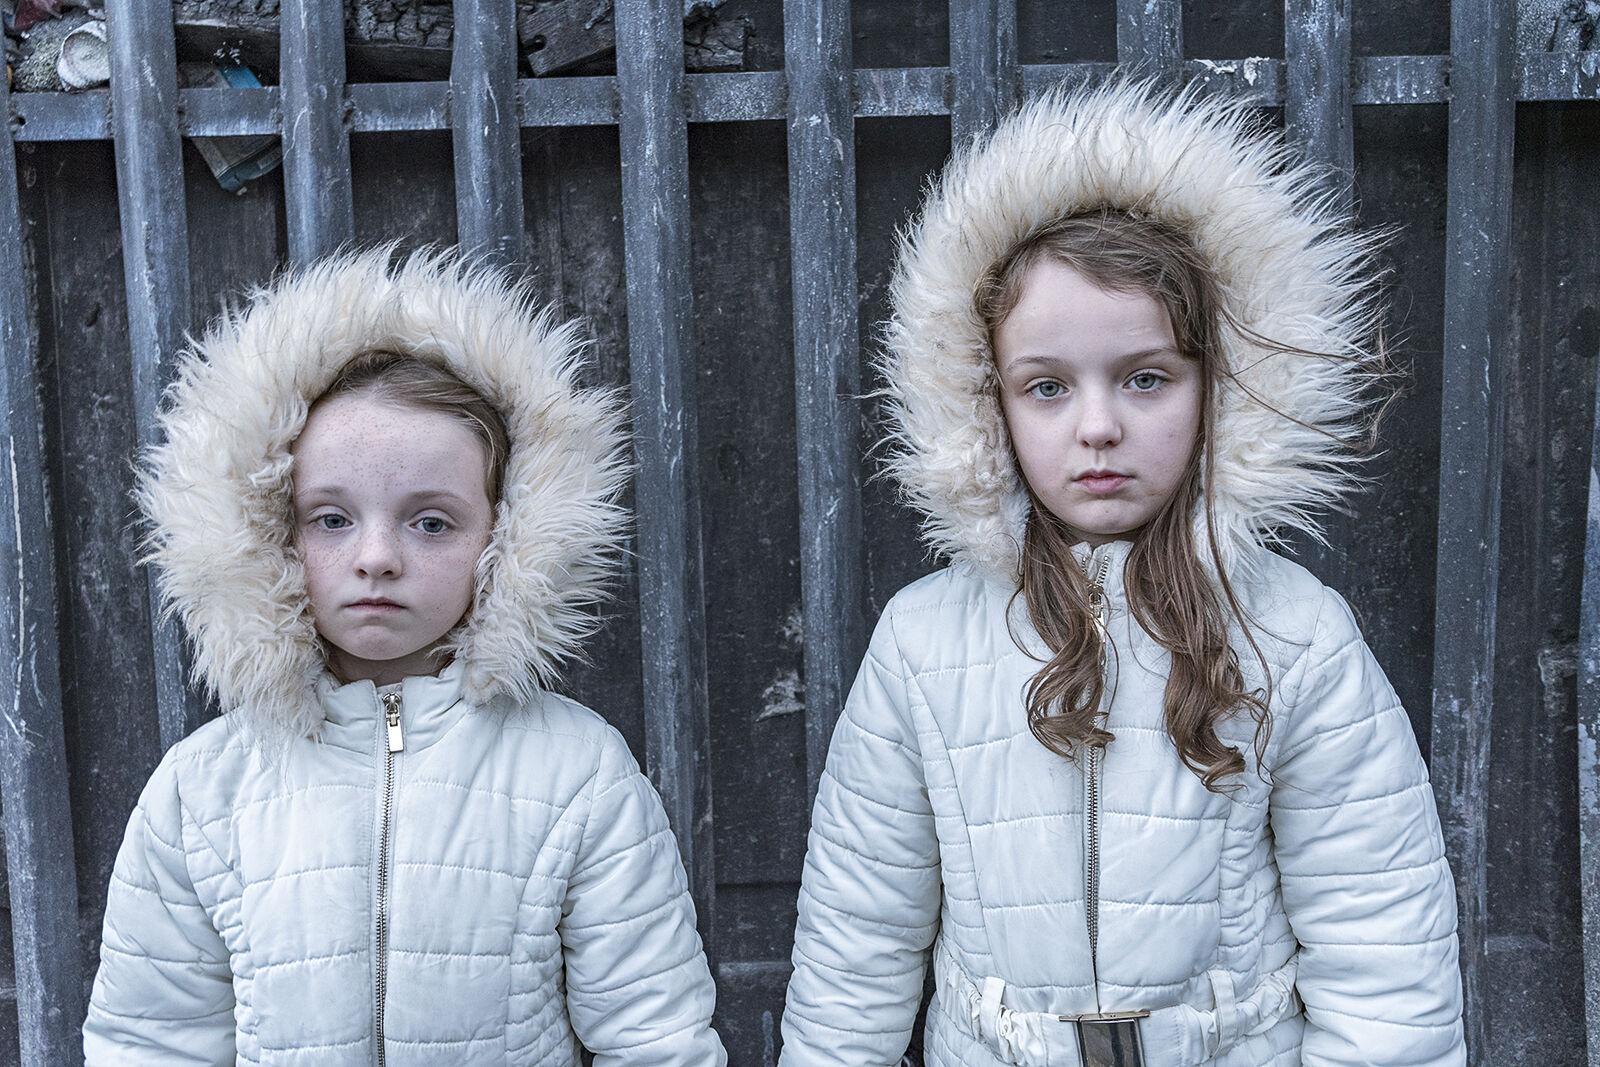 Bridget and Kathleen, Sisters, Dublin, Ireland 2020